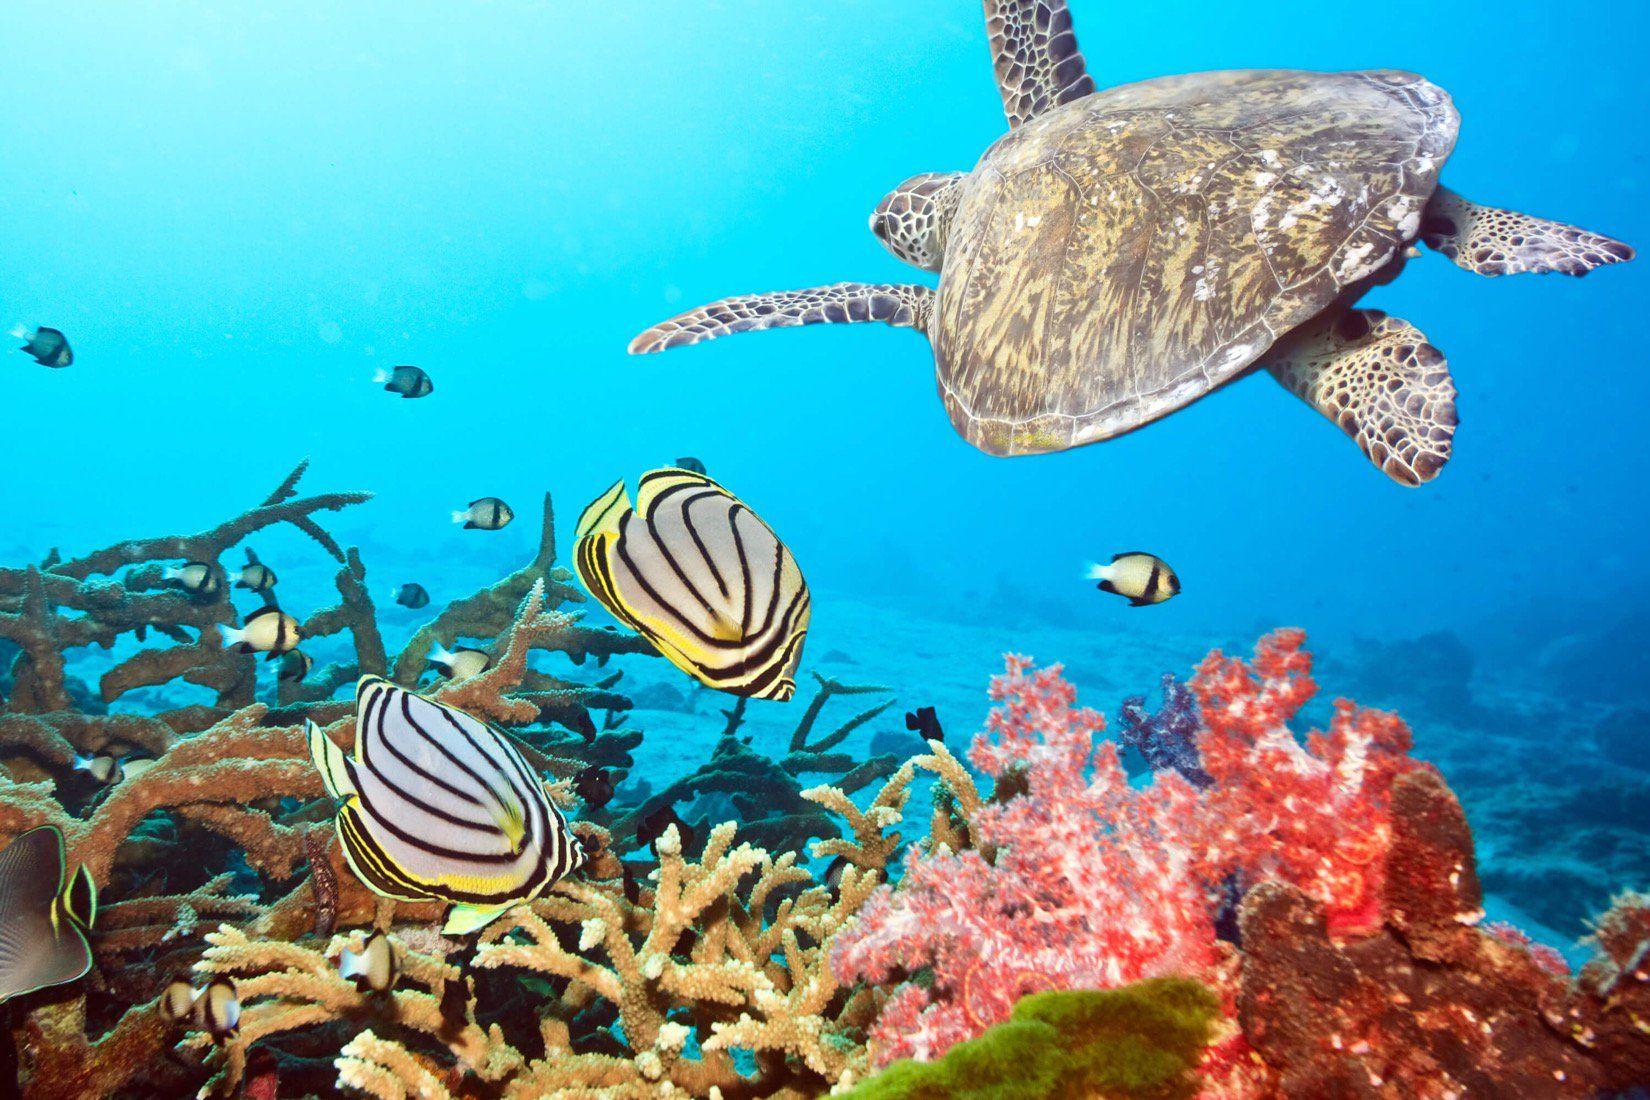 Animal Wallpaper Wildlife Wallpaper Murals Wallpaper Sea Turtle Wallpaper Underwater Animals Animal Wallpaper